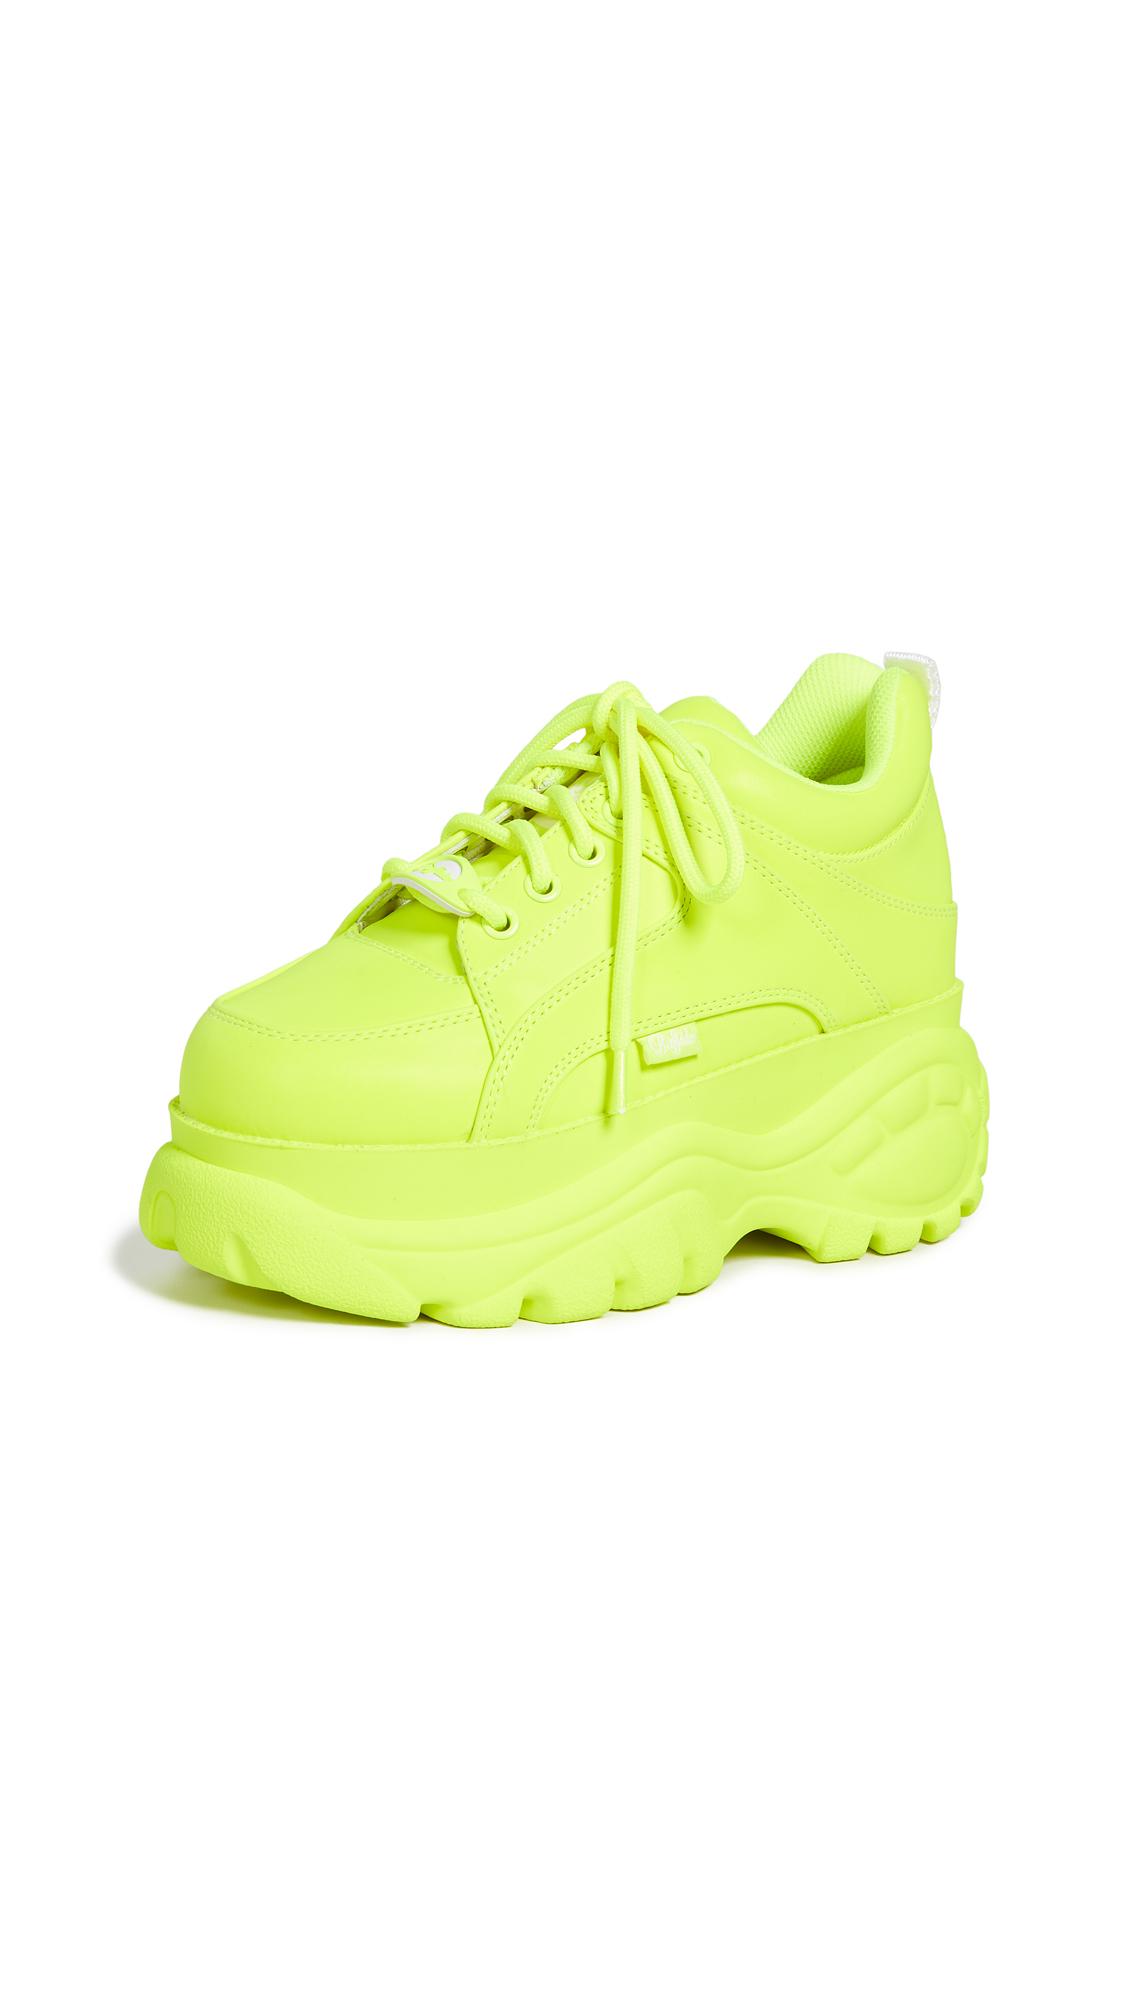 Buffalo London 1337-14 Classic Kicks Sneakers - Neon Yellow